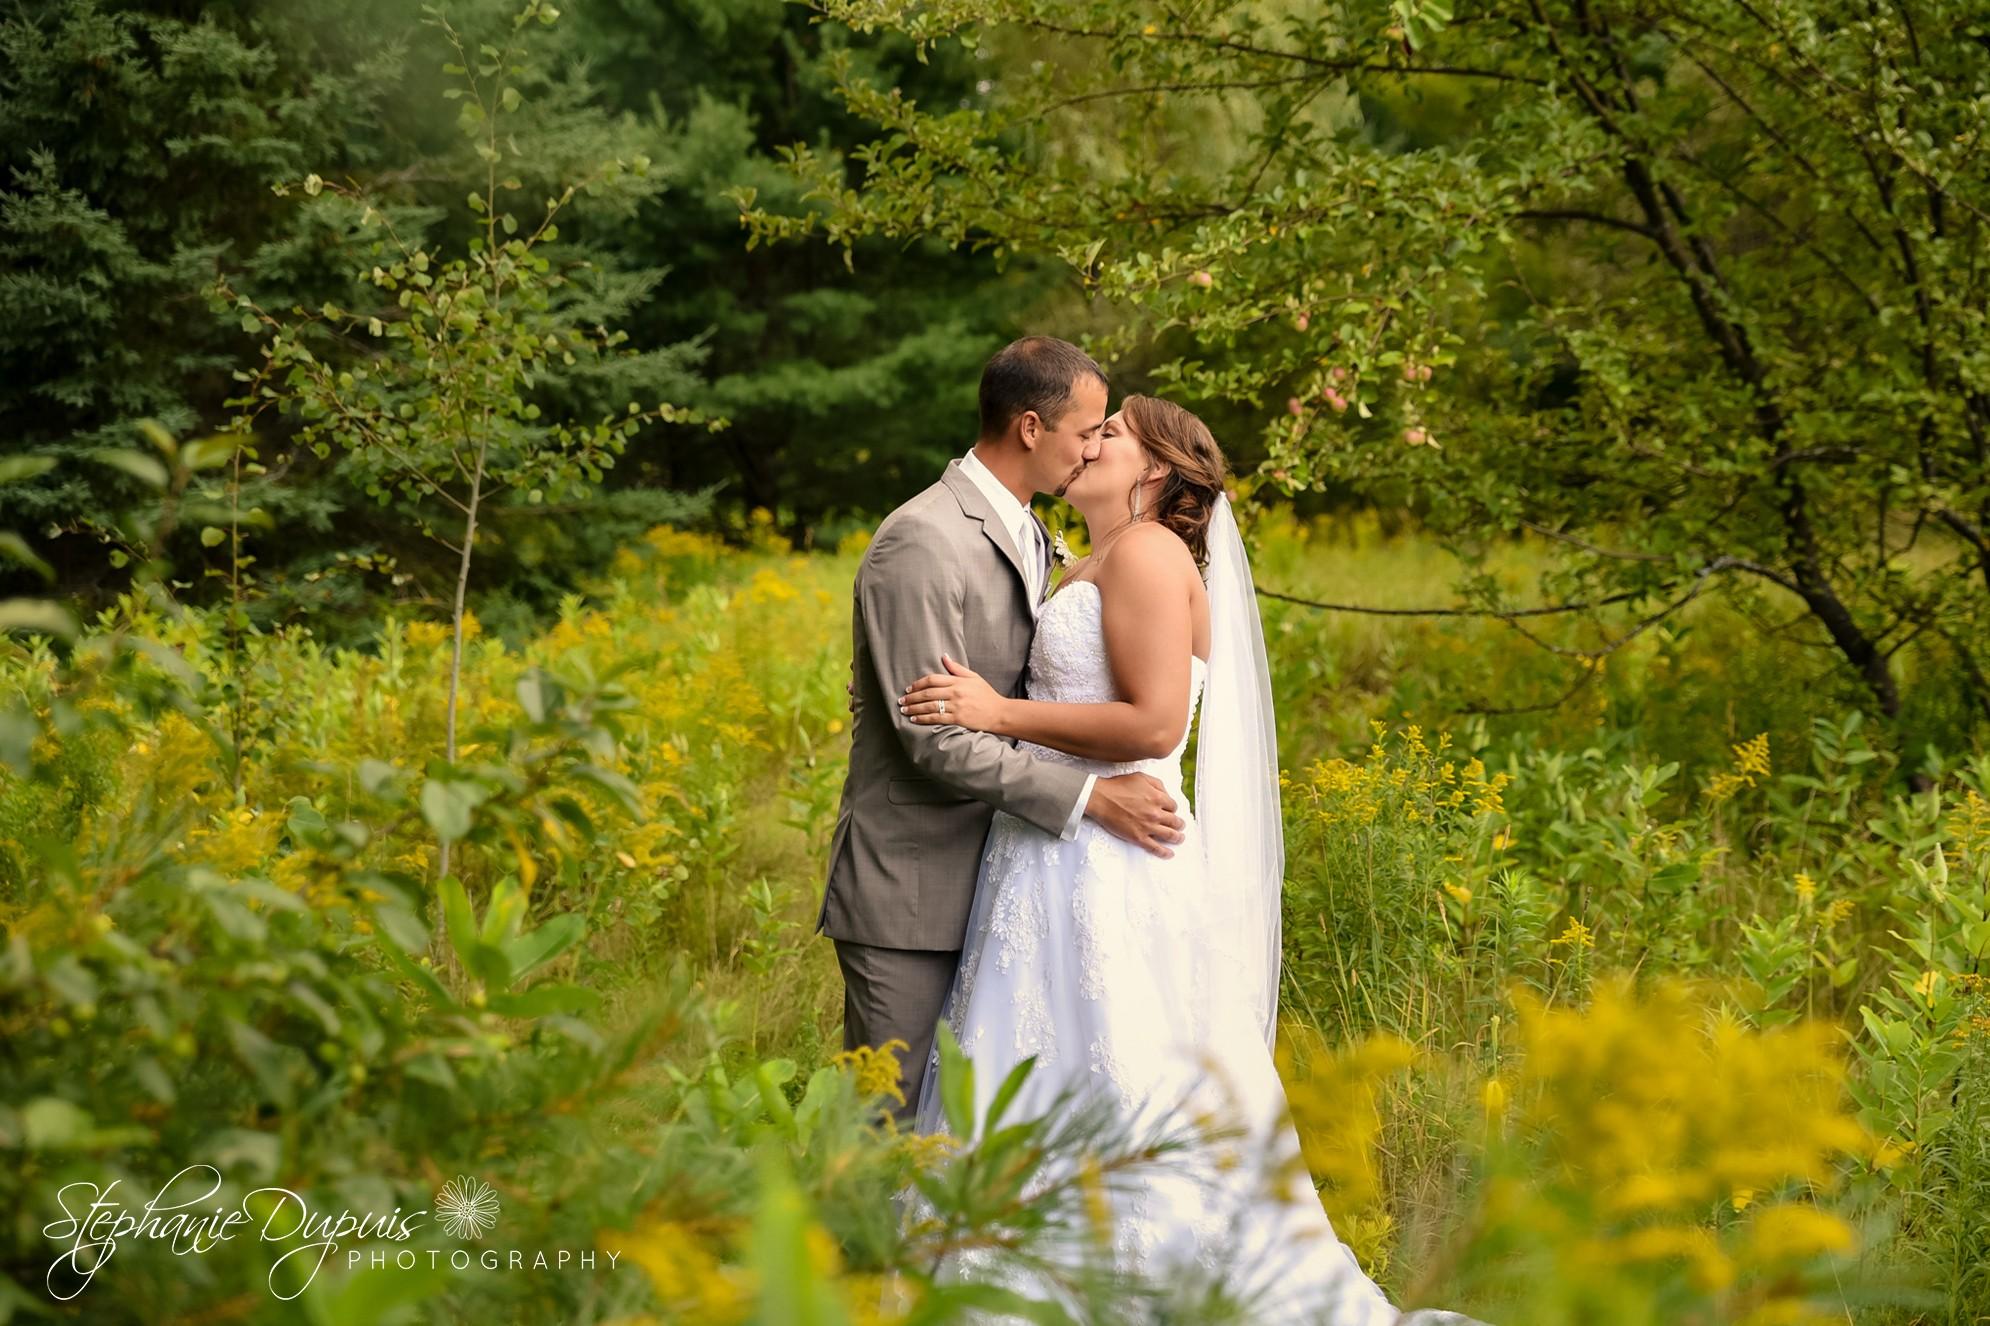 Jefferson Wedding Photographer 04 3 - Portfolio: Nason Wedding